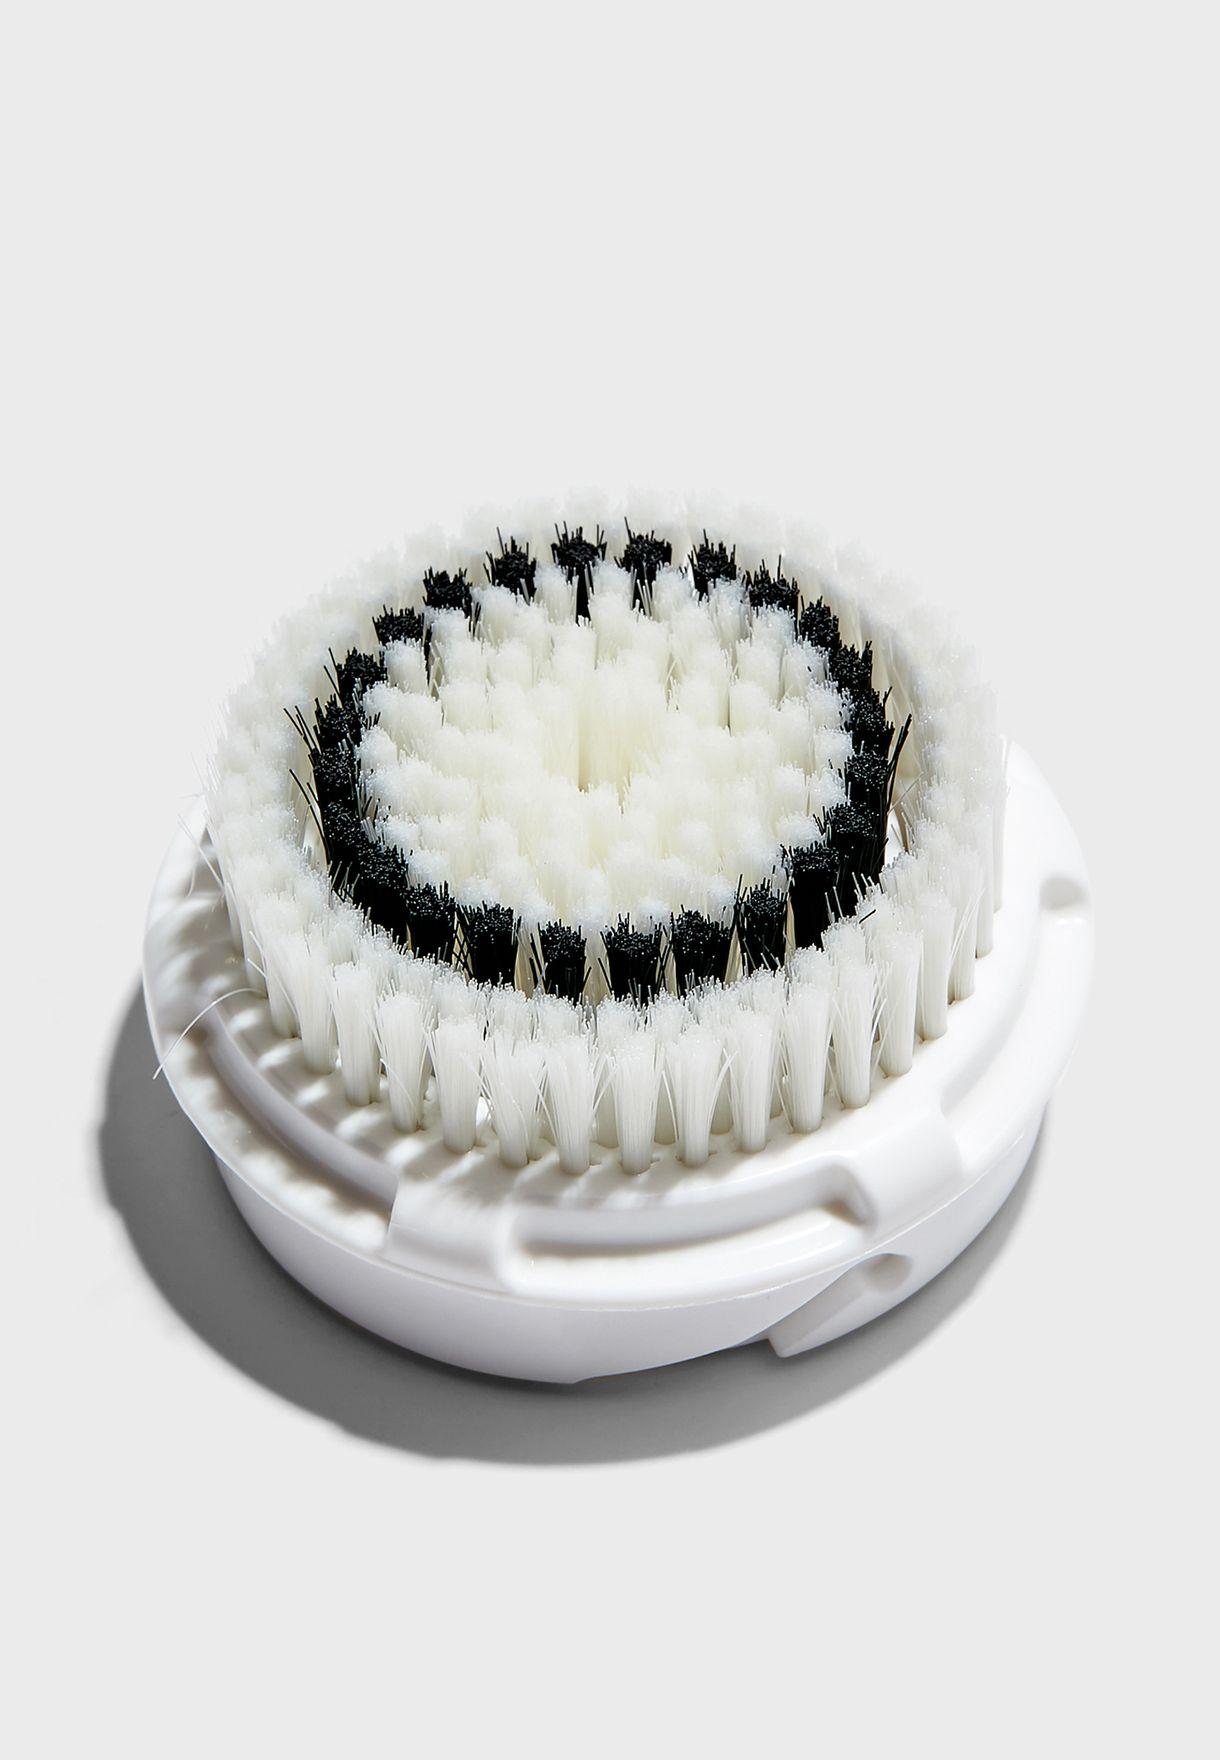 Sensitive Skin Cleansing Brush Head